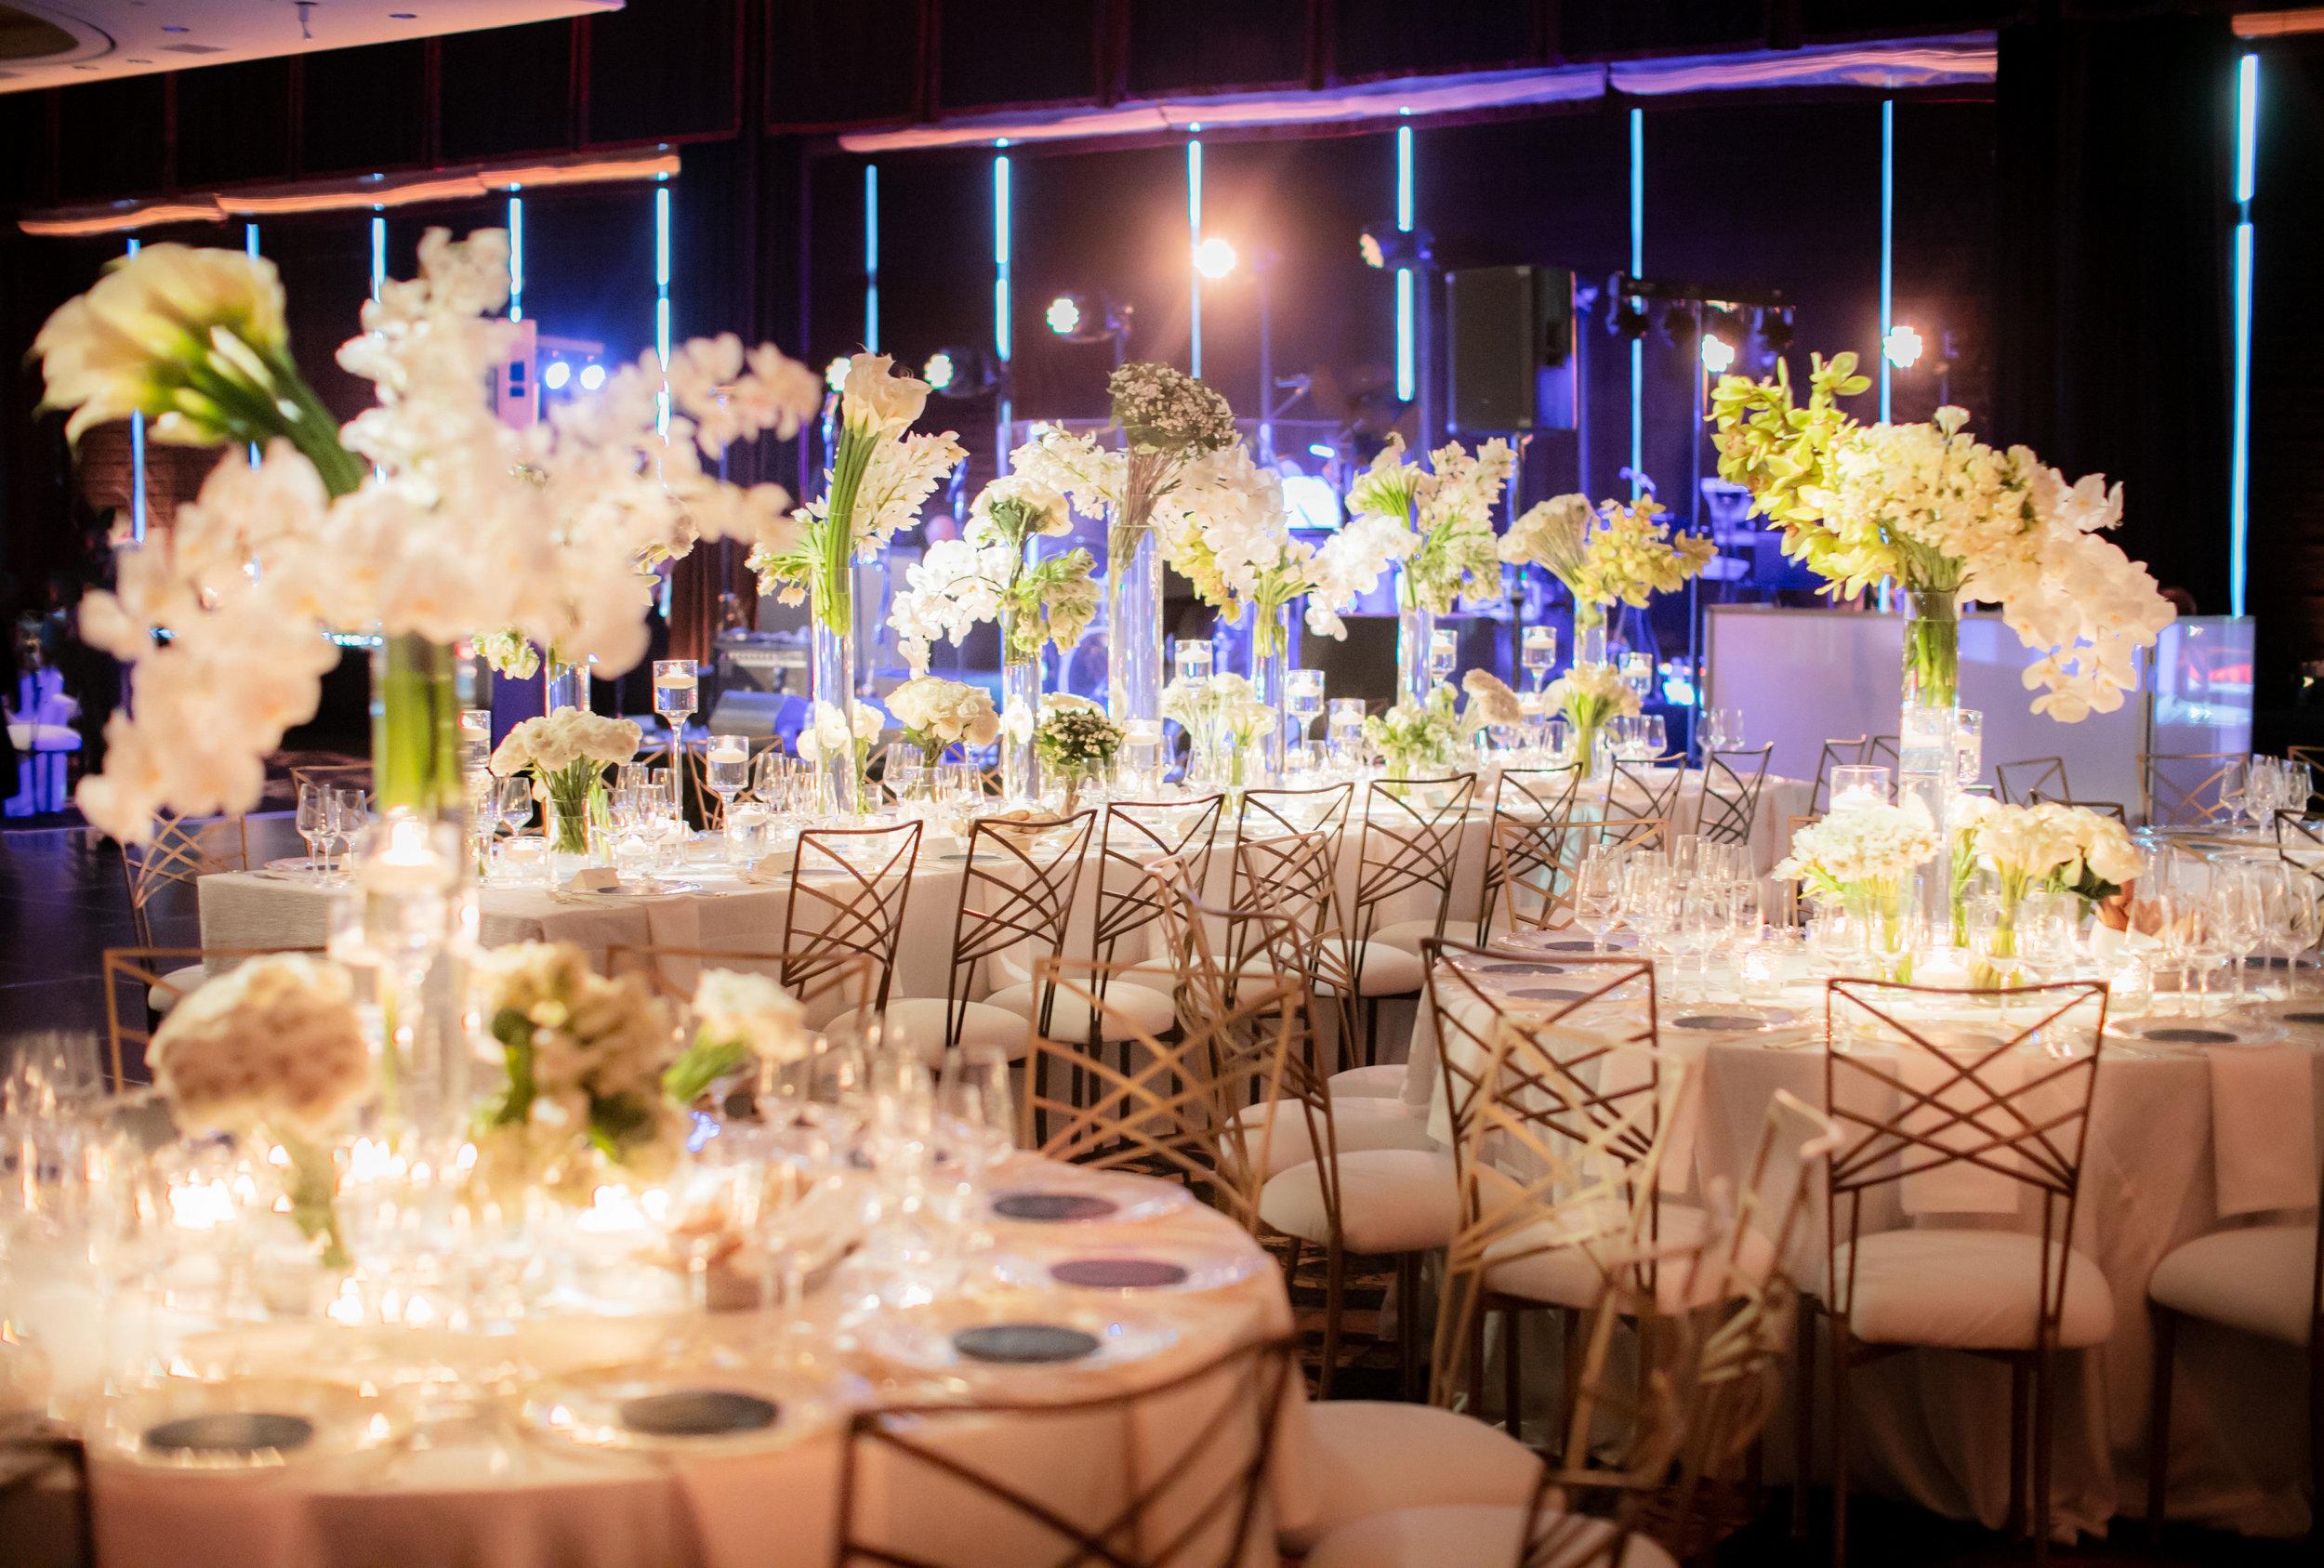 Andrea-Freeman-Events-NY-Wedding-Planner-Mandarin-Oriental-Wedding-13.jpg